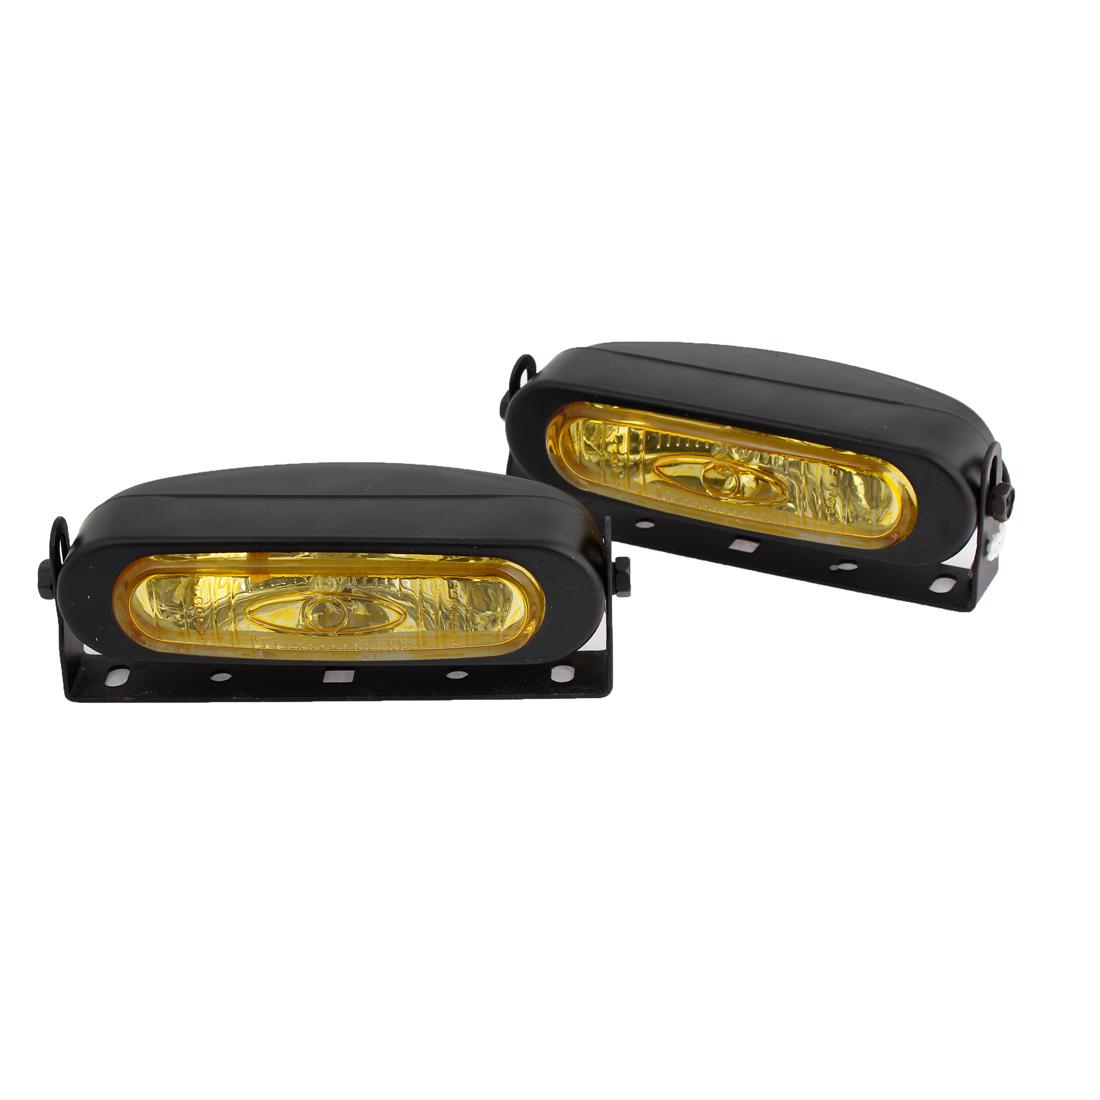 2 Pcs Black Yellow Casing H3 Yellow Light Fog Halogen Lamp Headlamp 55W DC 12V